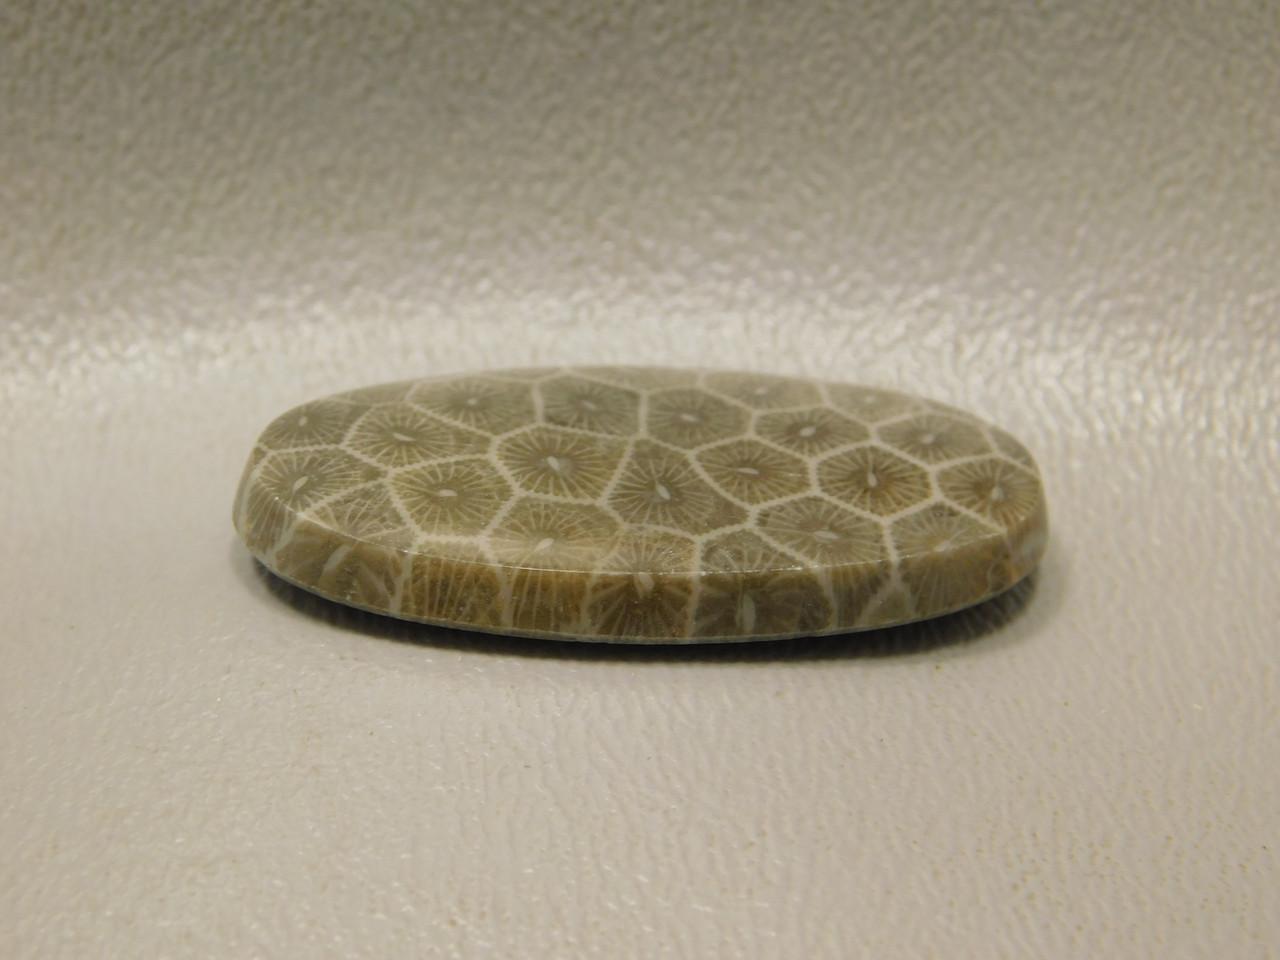 Cabochon Pseudomorph Fossil Coral Jasper #F13